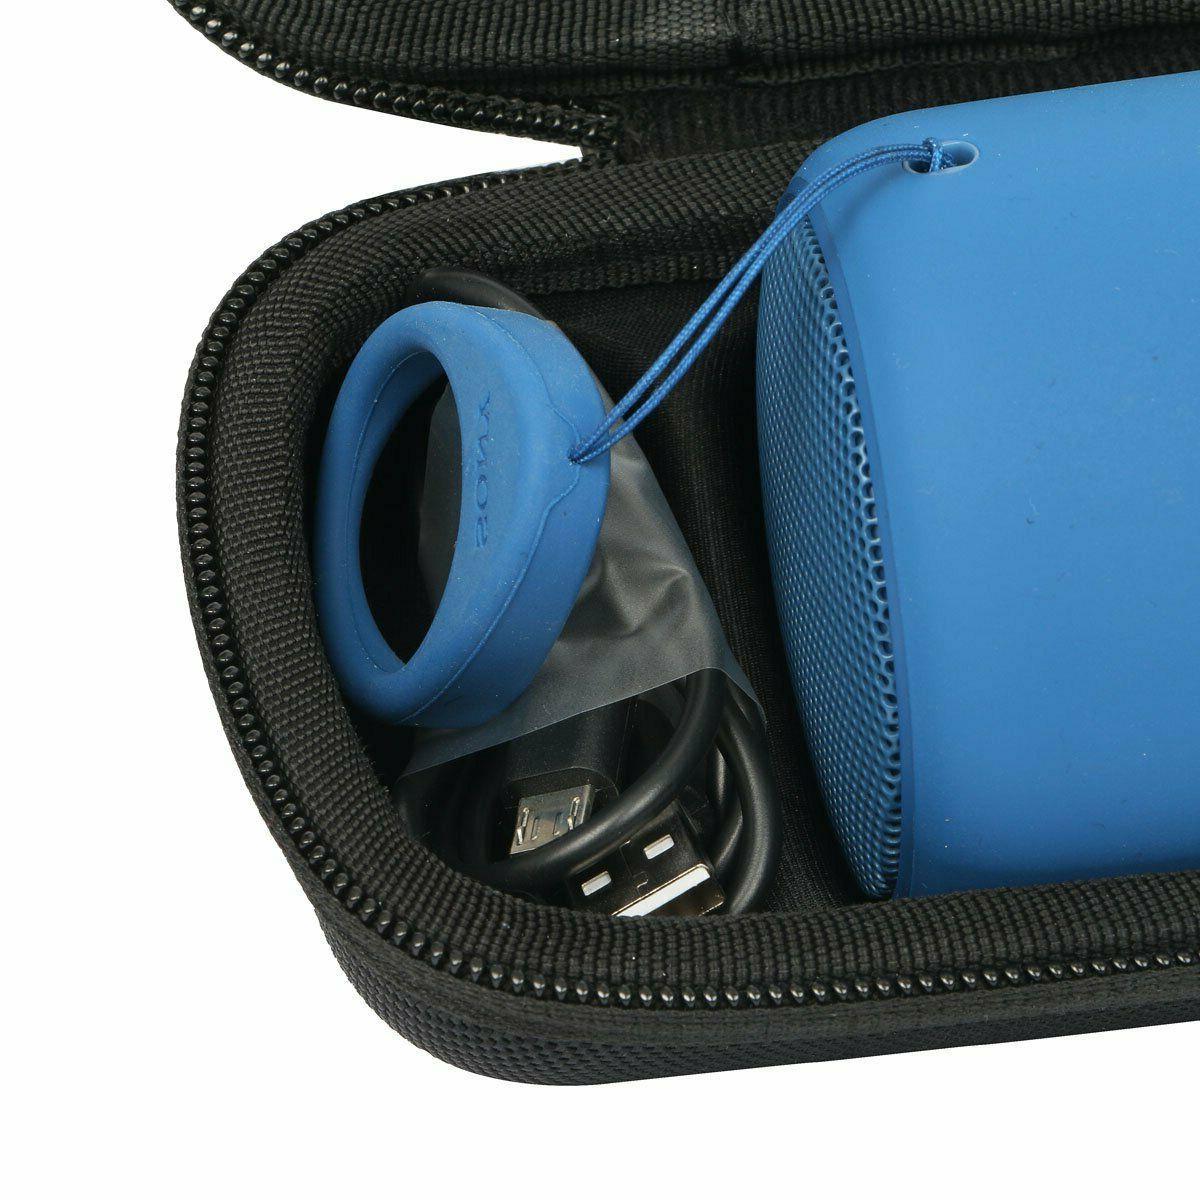 For Sony XB10 Wireless with Potable Hard